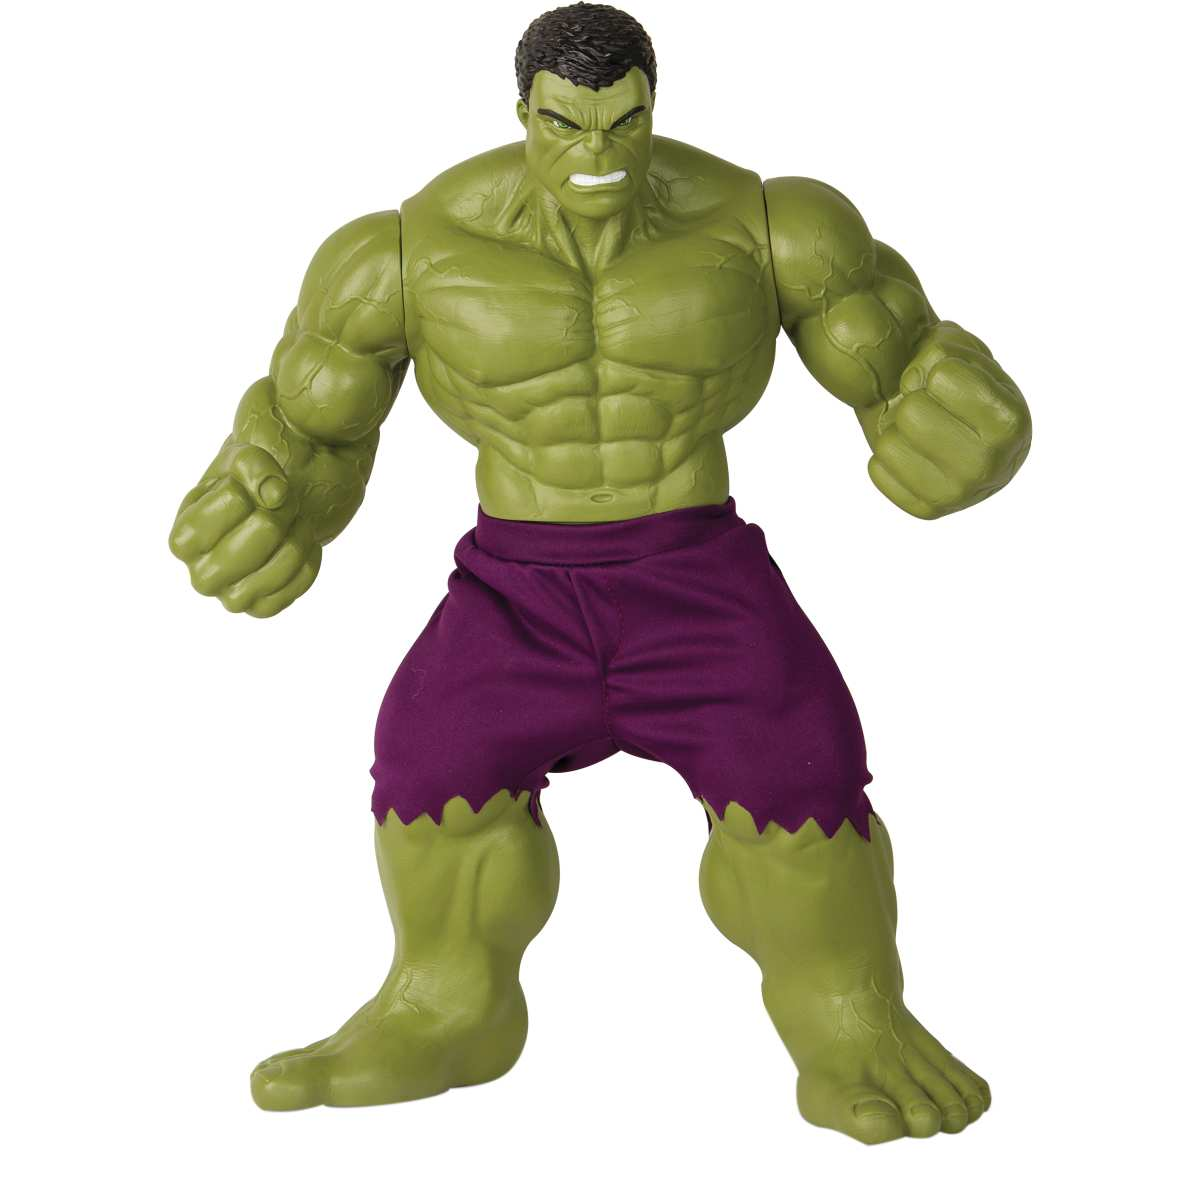 Boneco Hulk Verde Revolution 50cm Marvel - Mimo